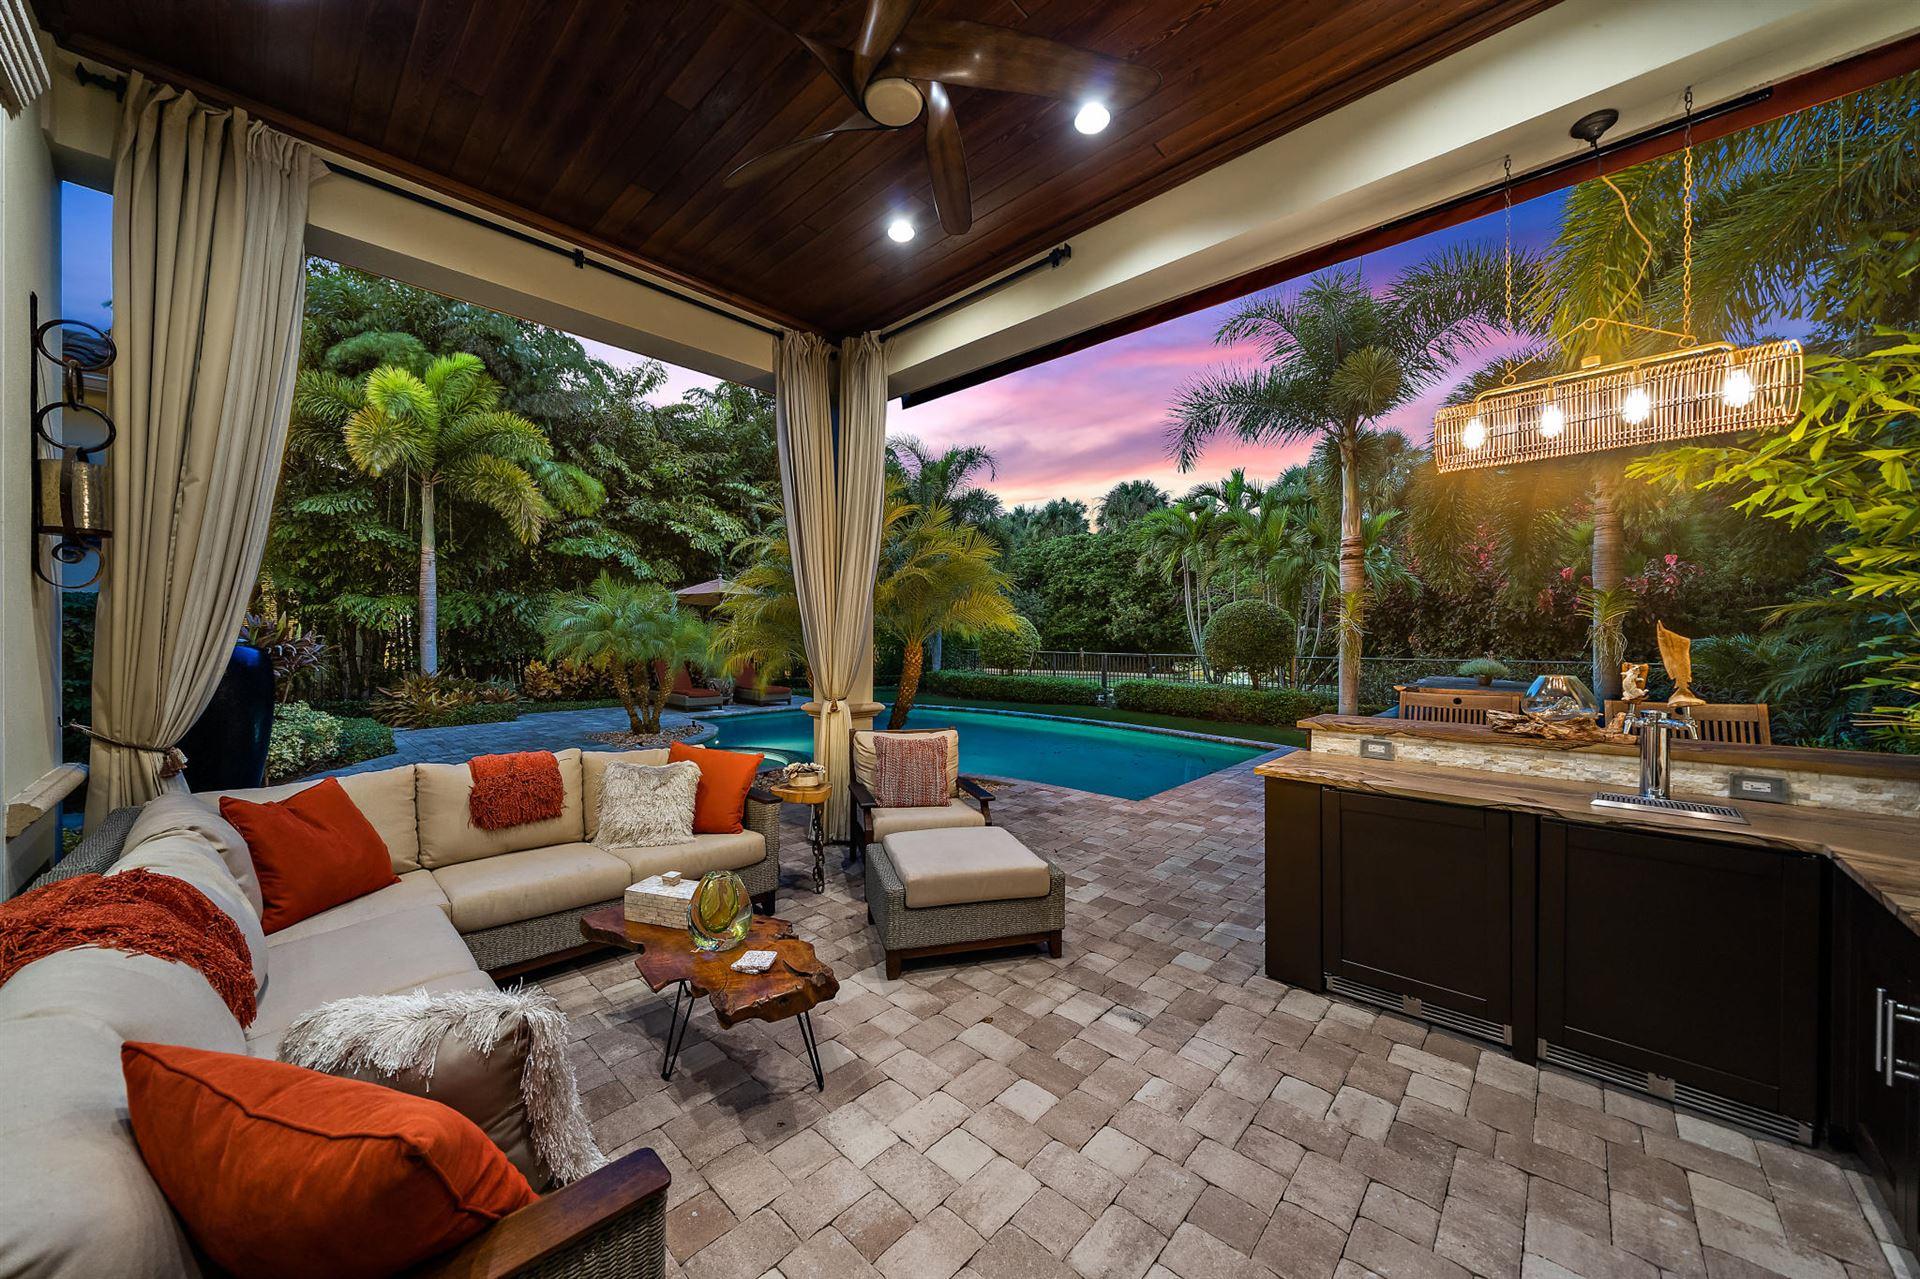 Photo of 11307 Caladium Lane, Palm Beach Gardens, FL 33418 (MLS # RX-10656112)